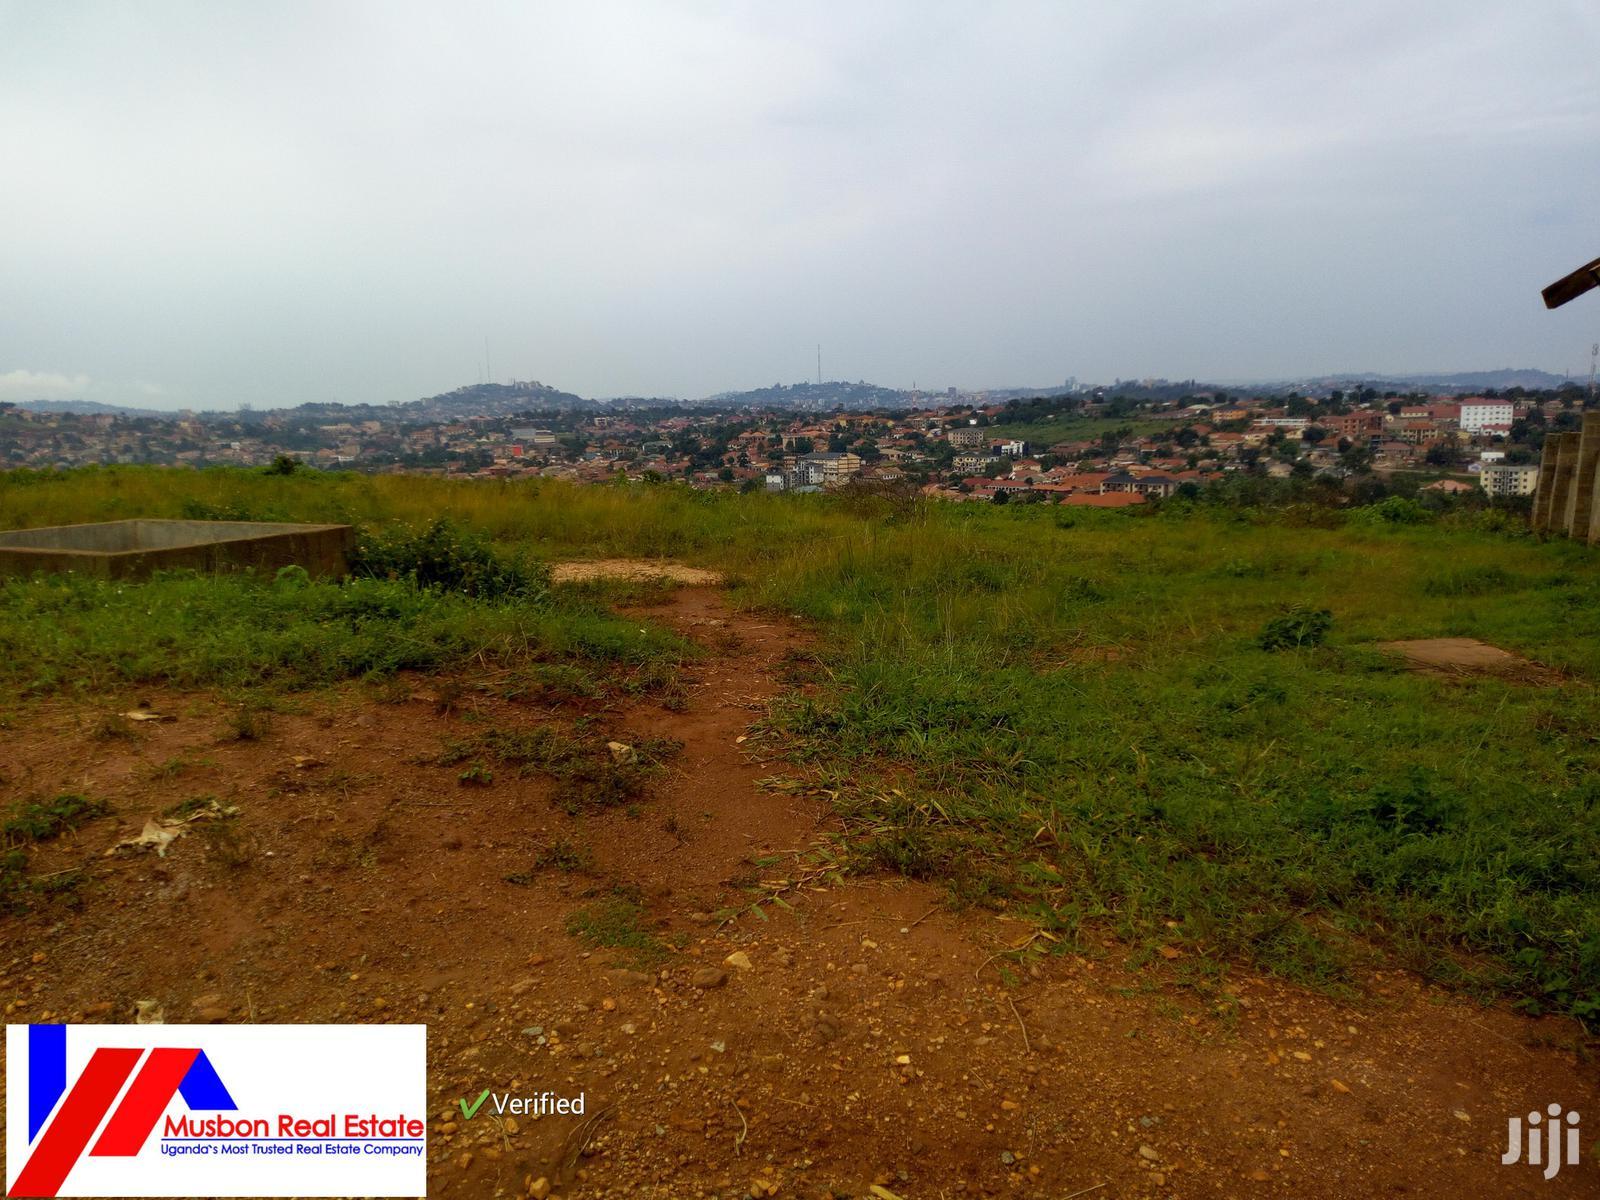 One Acre for Sale in Kyanja | Land & Plots For Sale for sale in Kampala, Central Region, Uganda